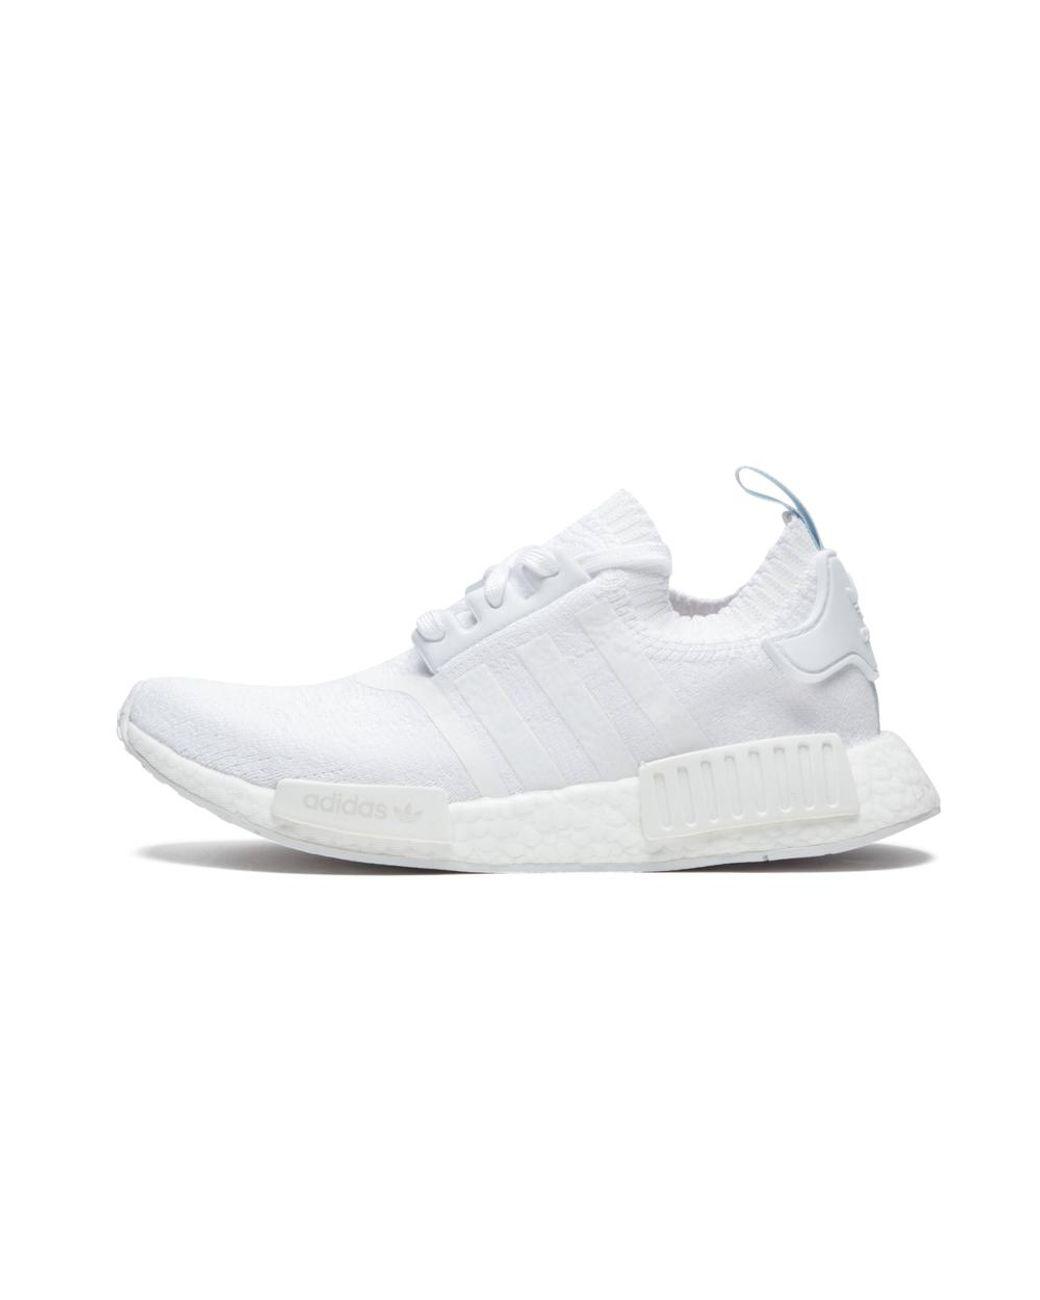 Nmd R1 Pk Womens Shoes